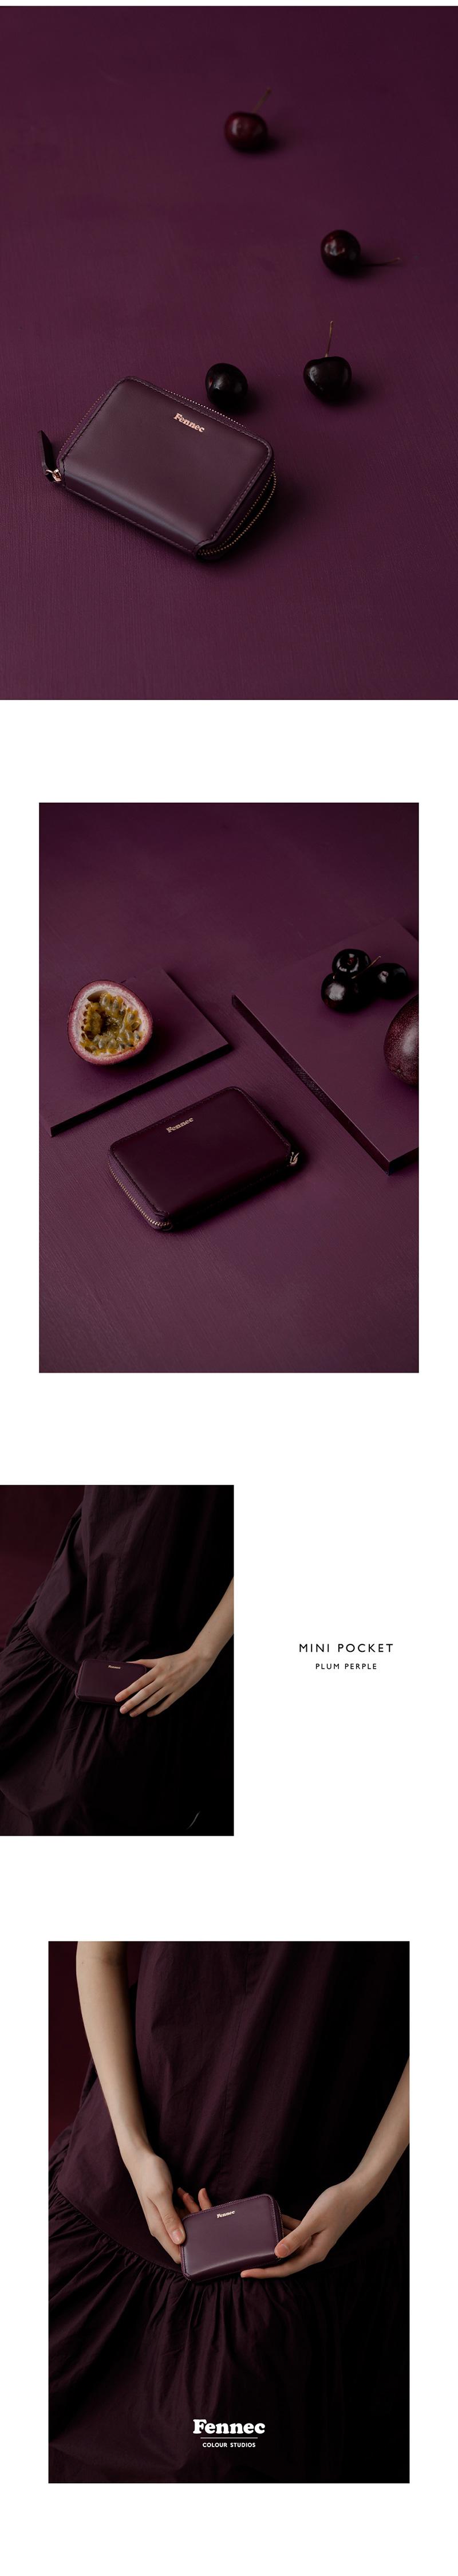 10x10_mini-pocket_pp_02.jpg